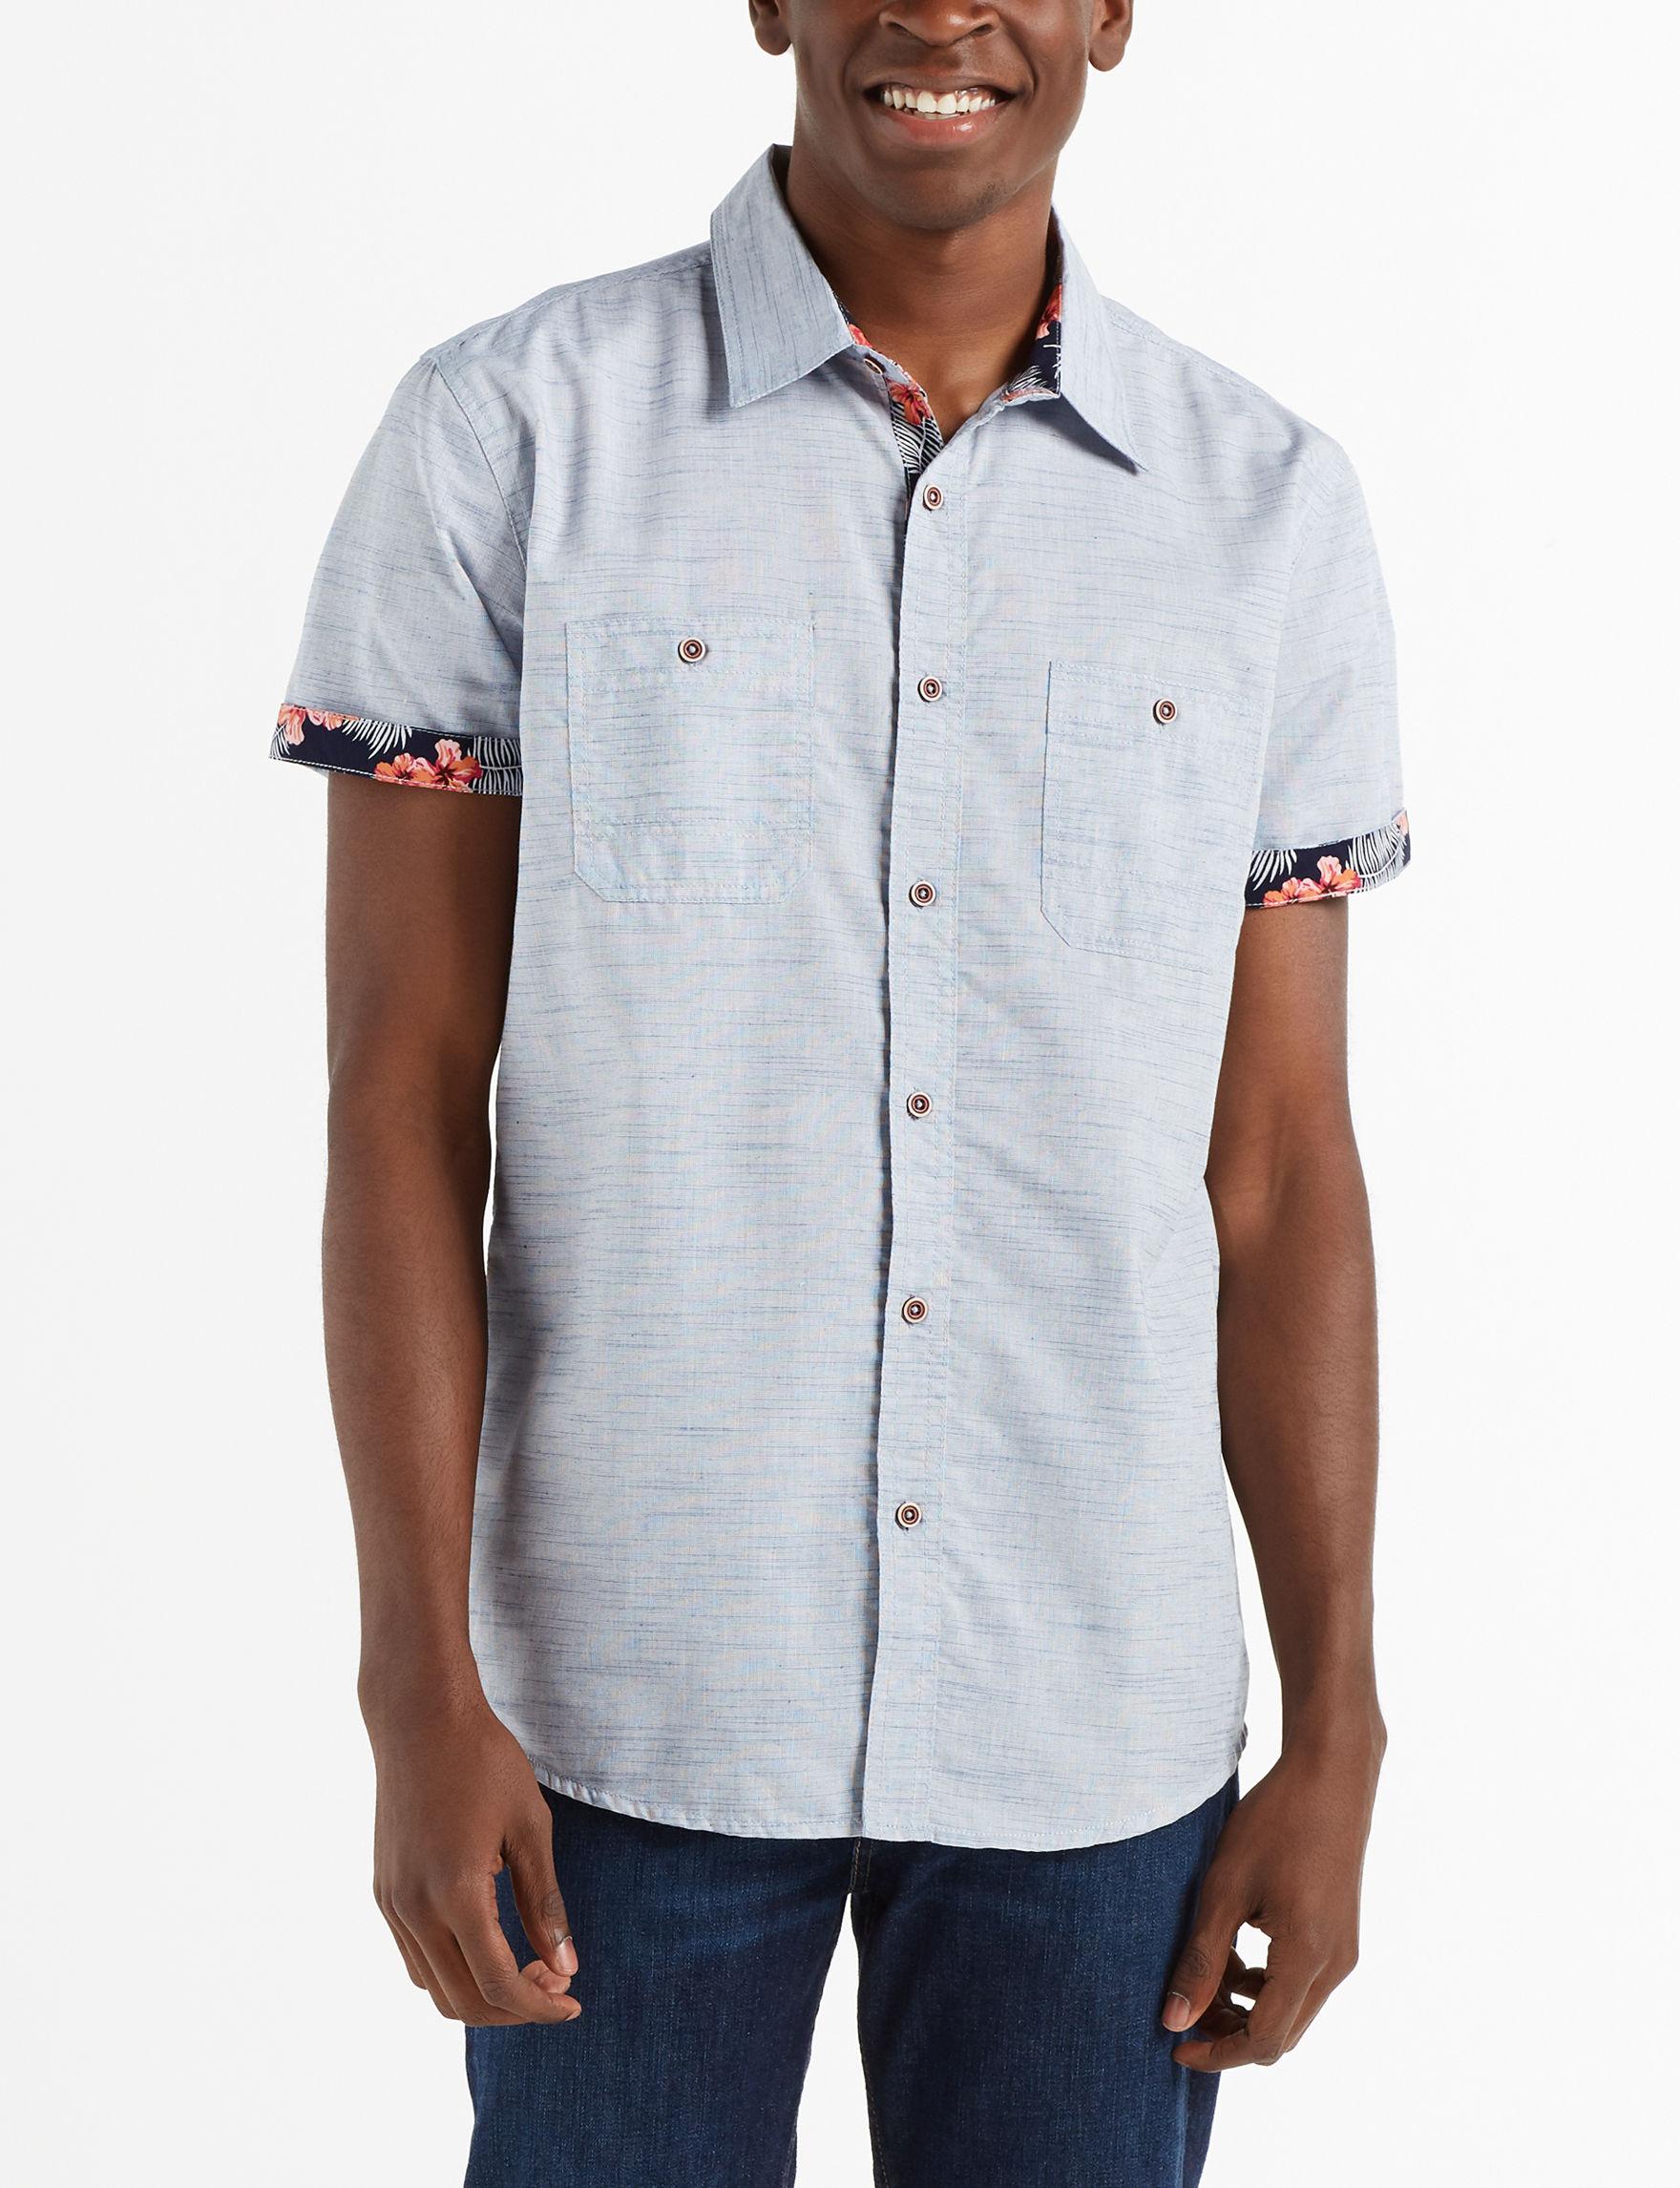 Modern Culture Blue Casual Button Down Shirts